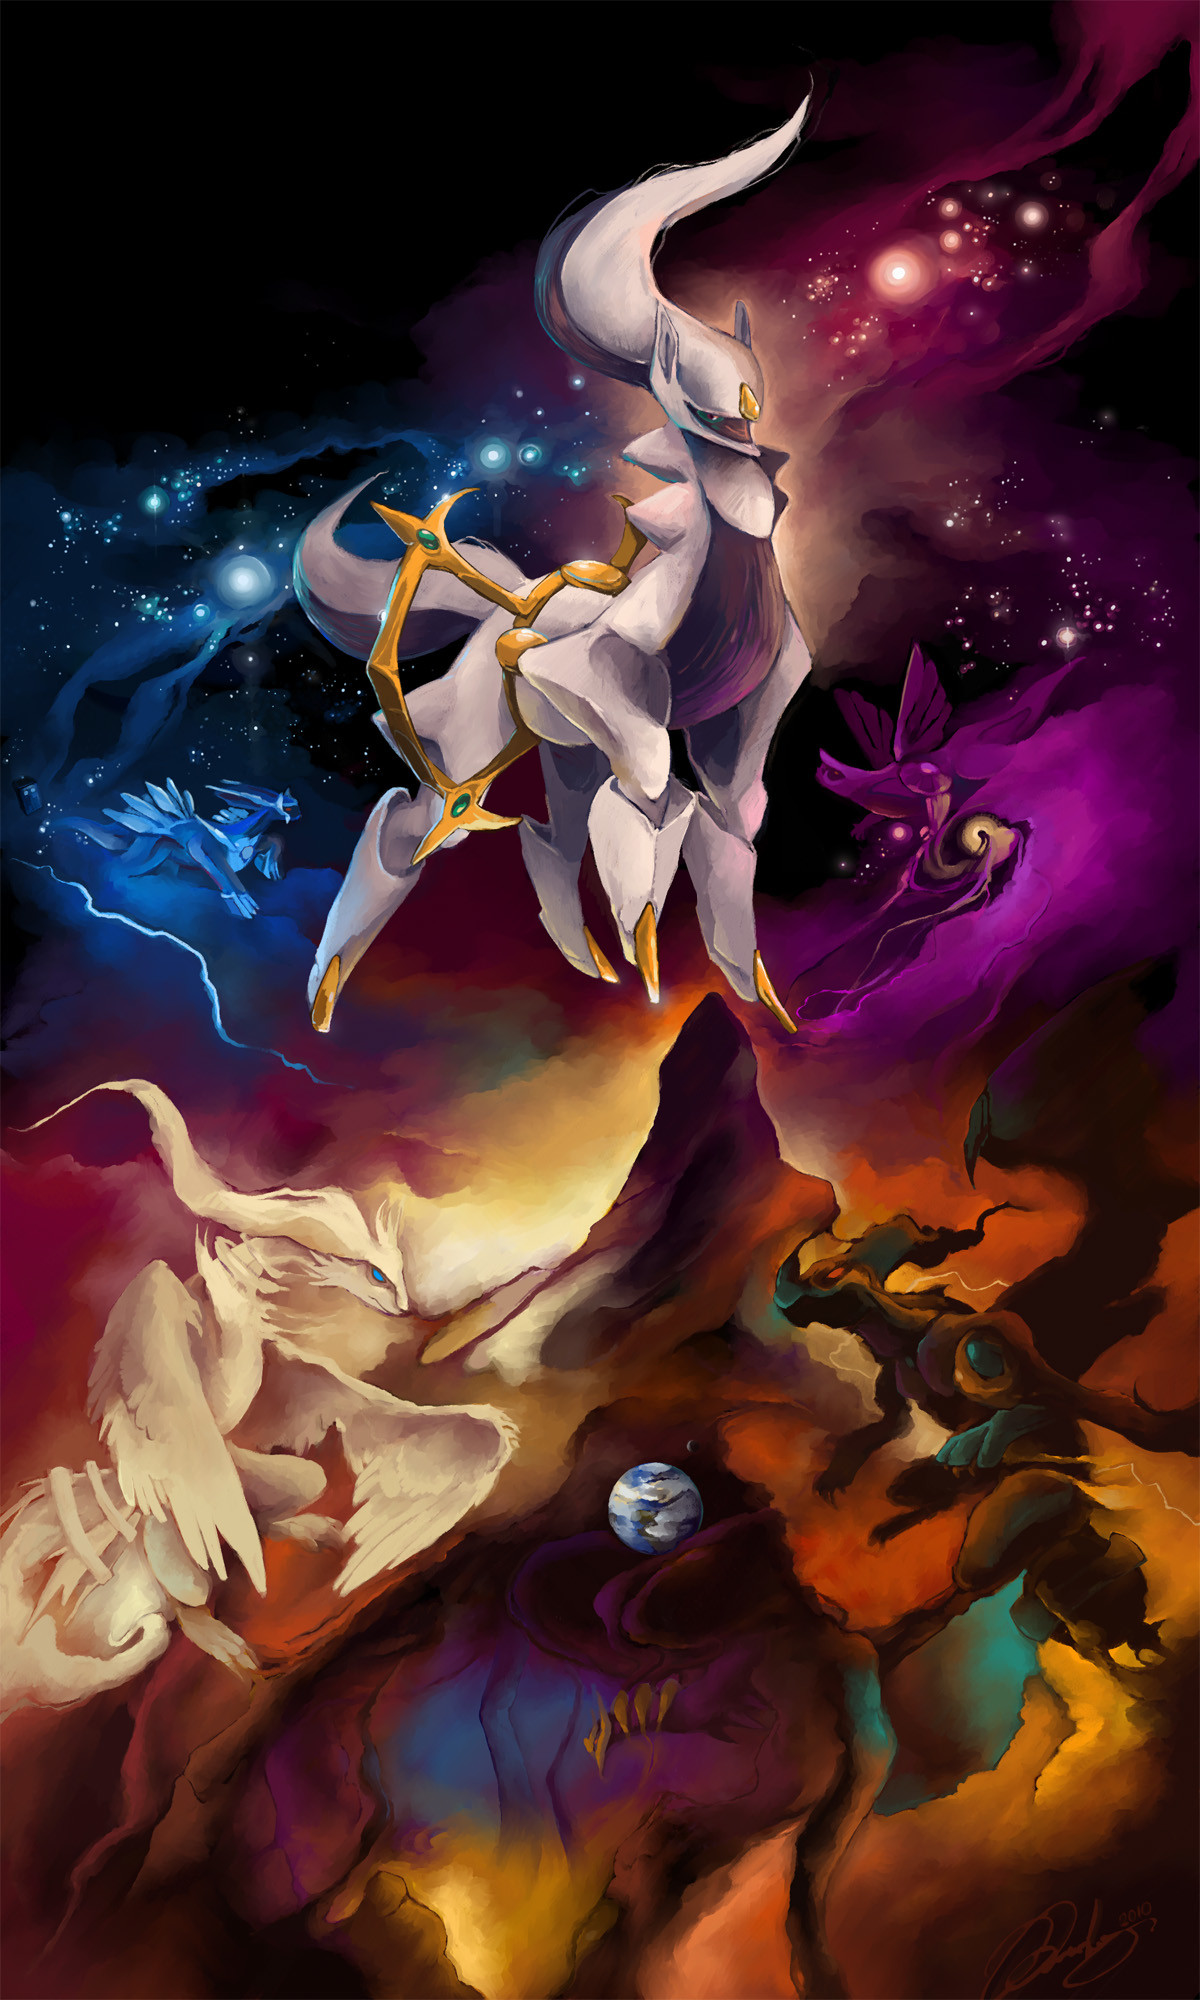 Pokemon Legendary Dialga and Palkia Wallpaper (51+ images)Arceus Vs Giratina Dialga And Palkia